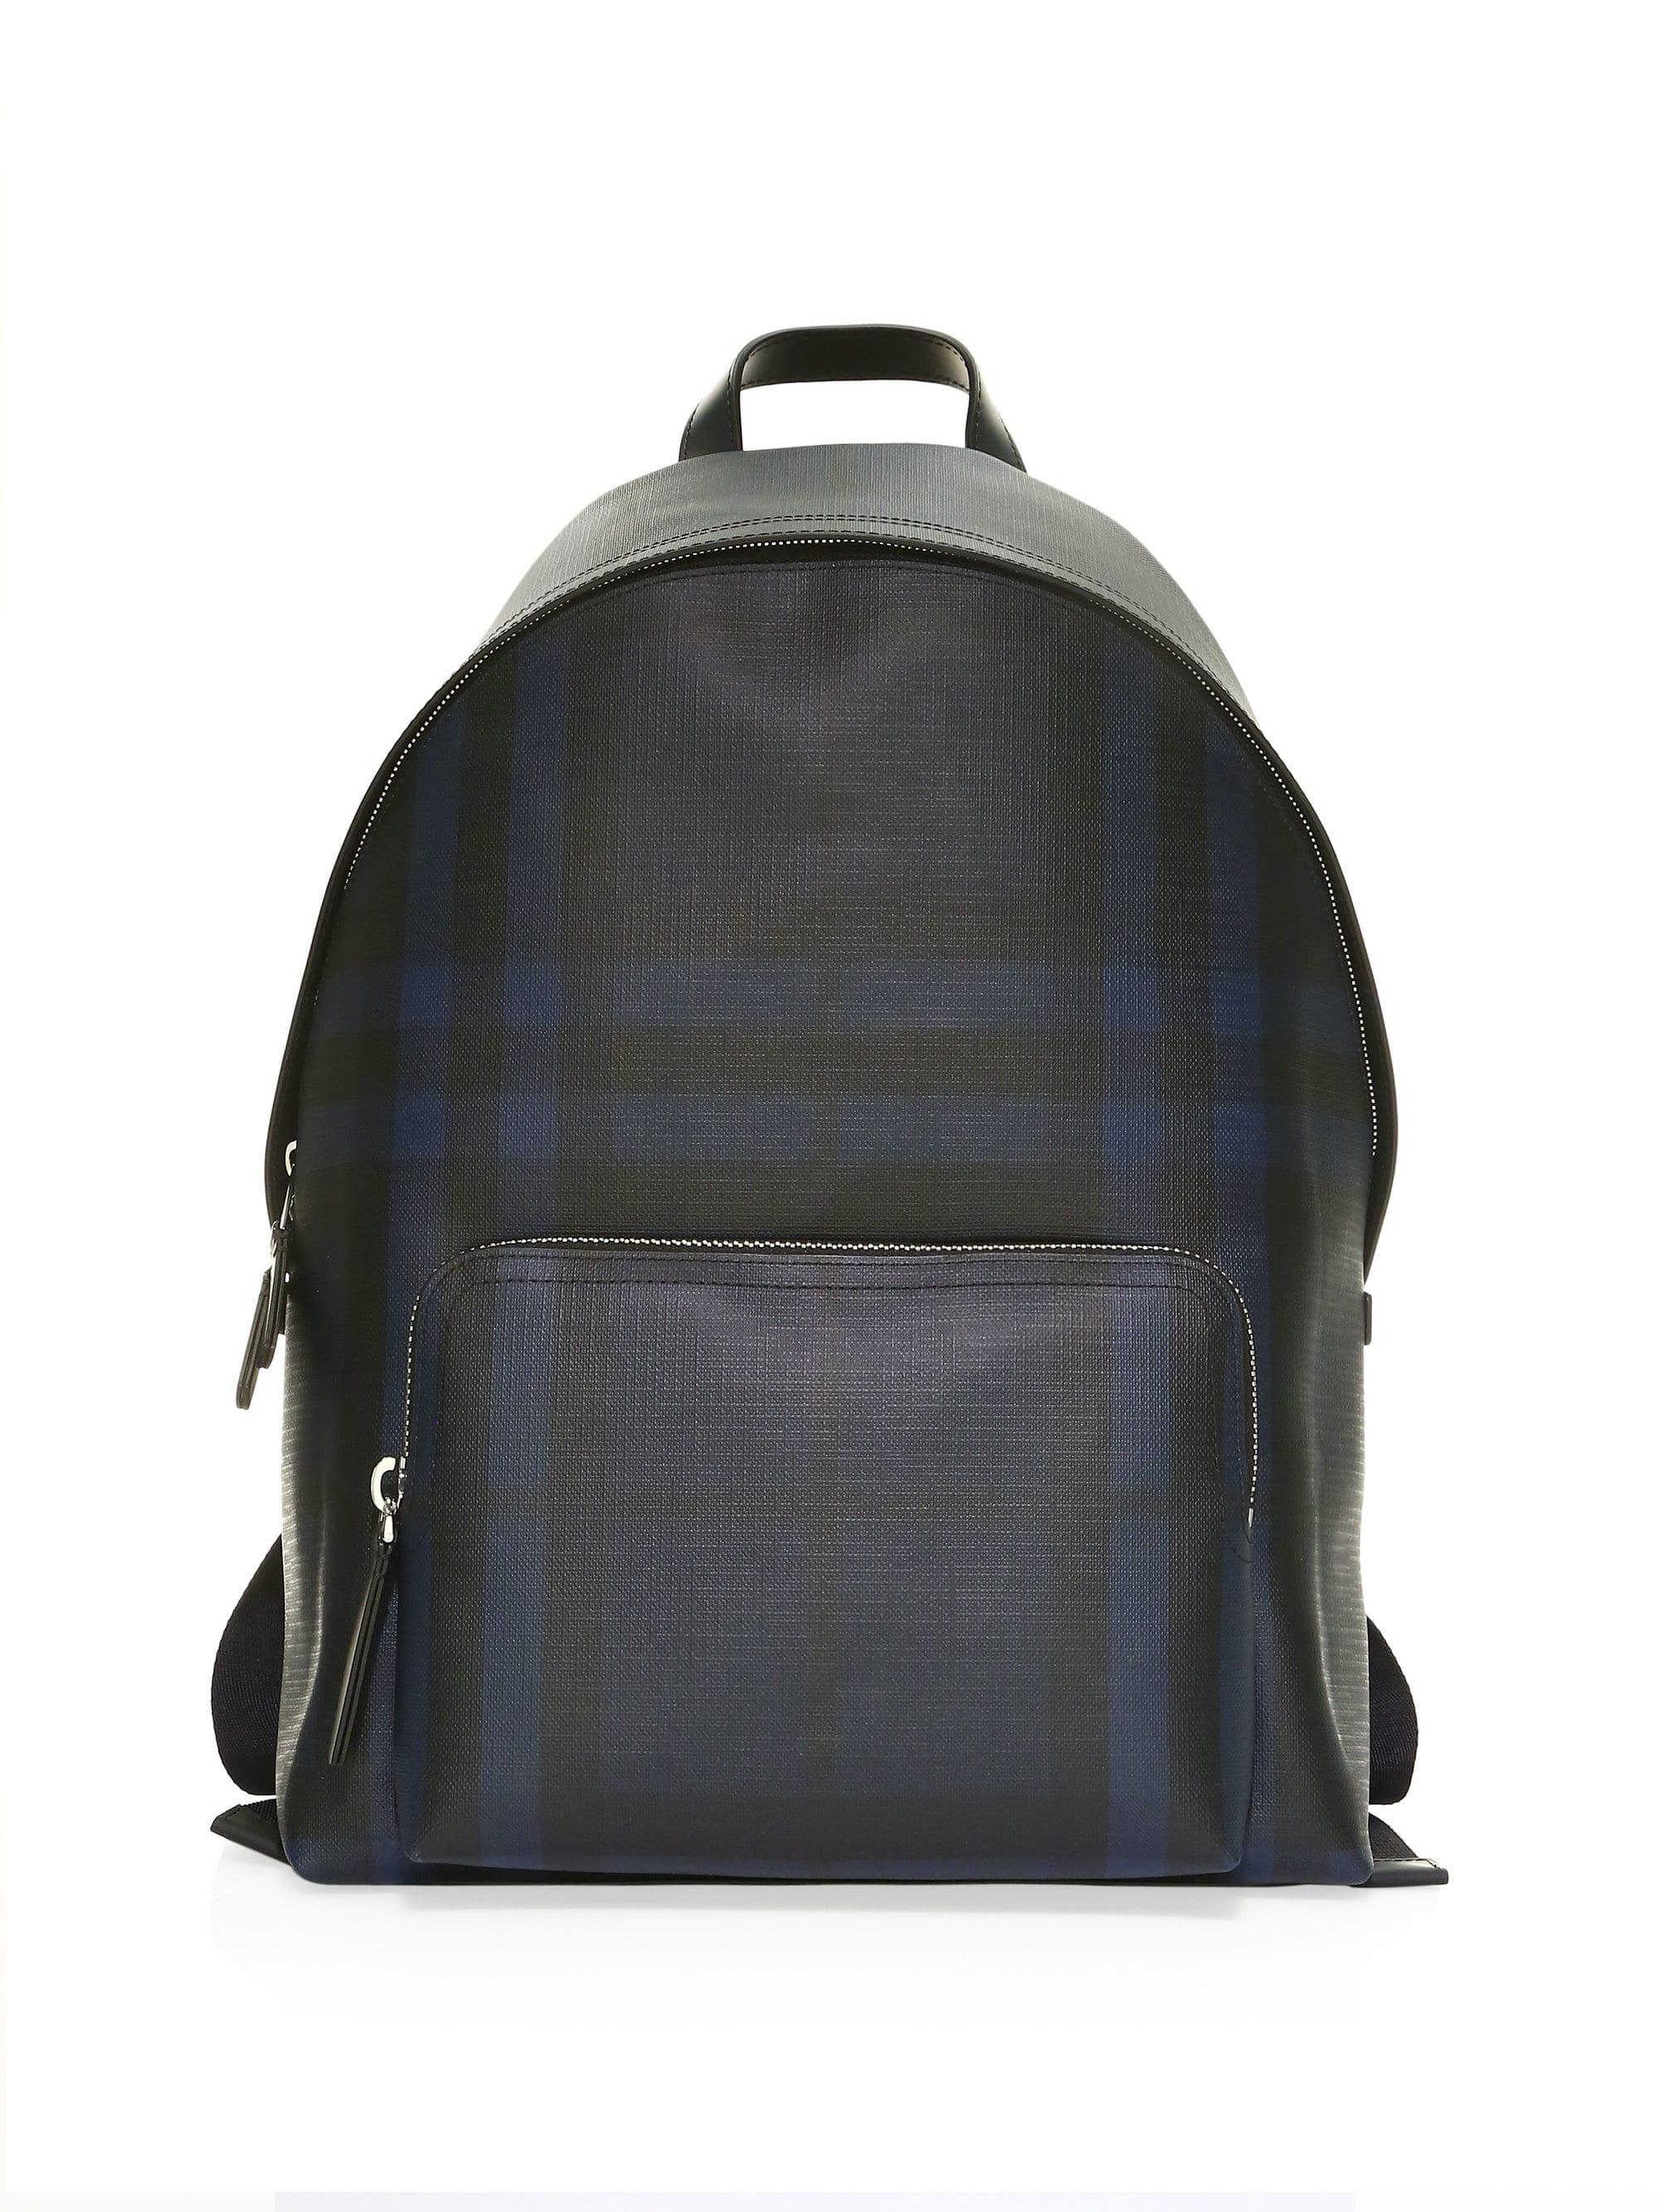 52bde0b21e41 Lyst - Burberry Men s London Check Abbeydale Backpack - Navy Black ...